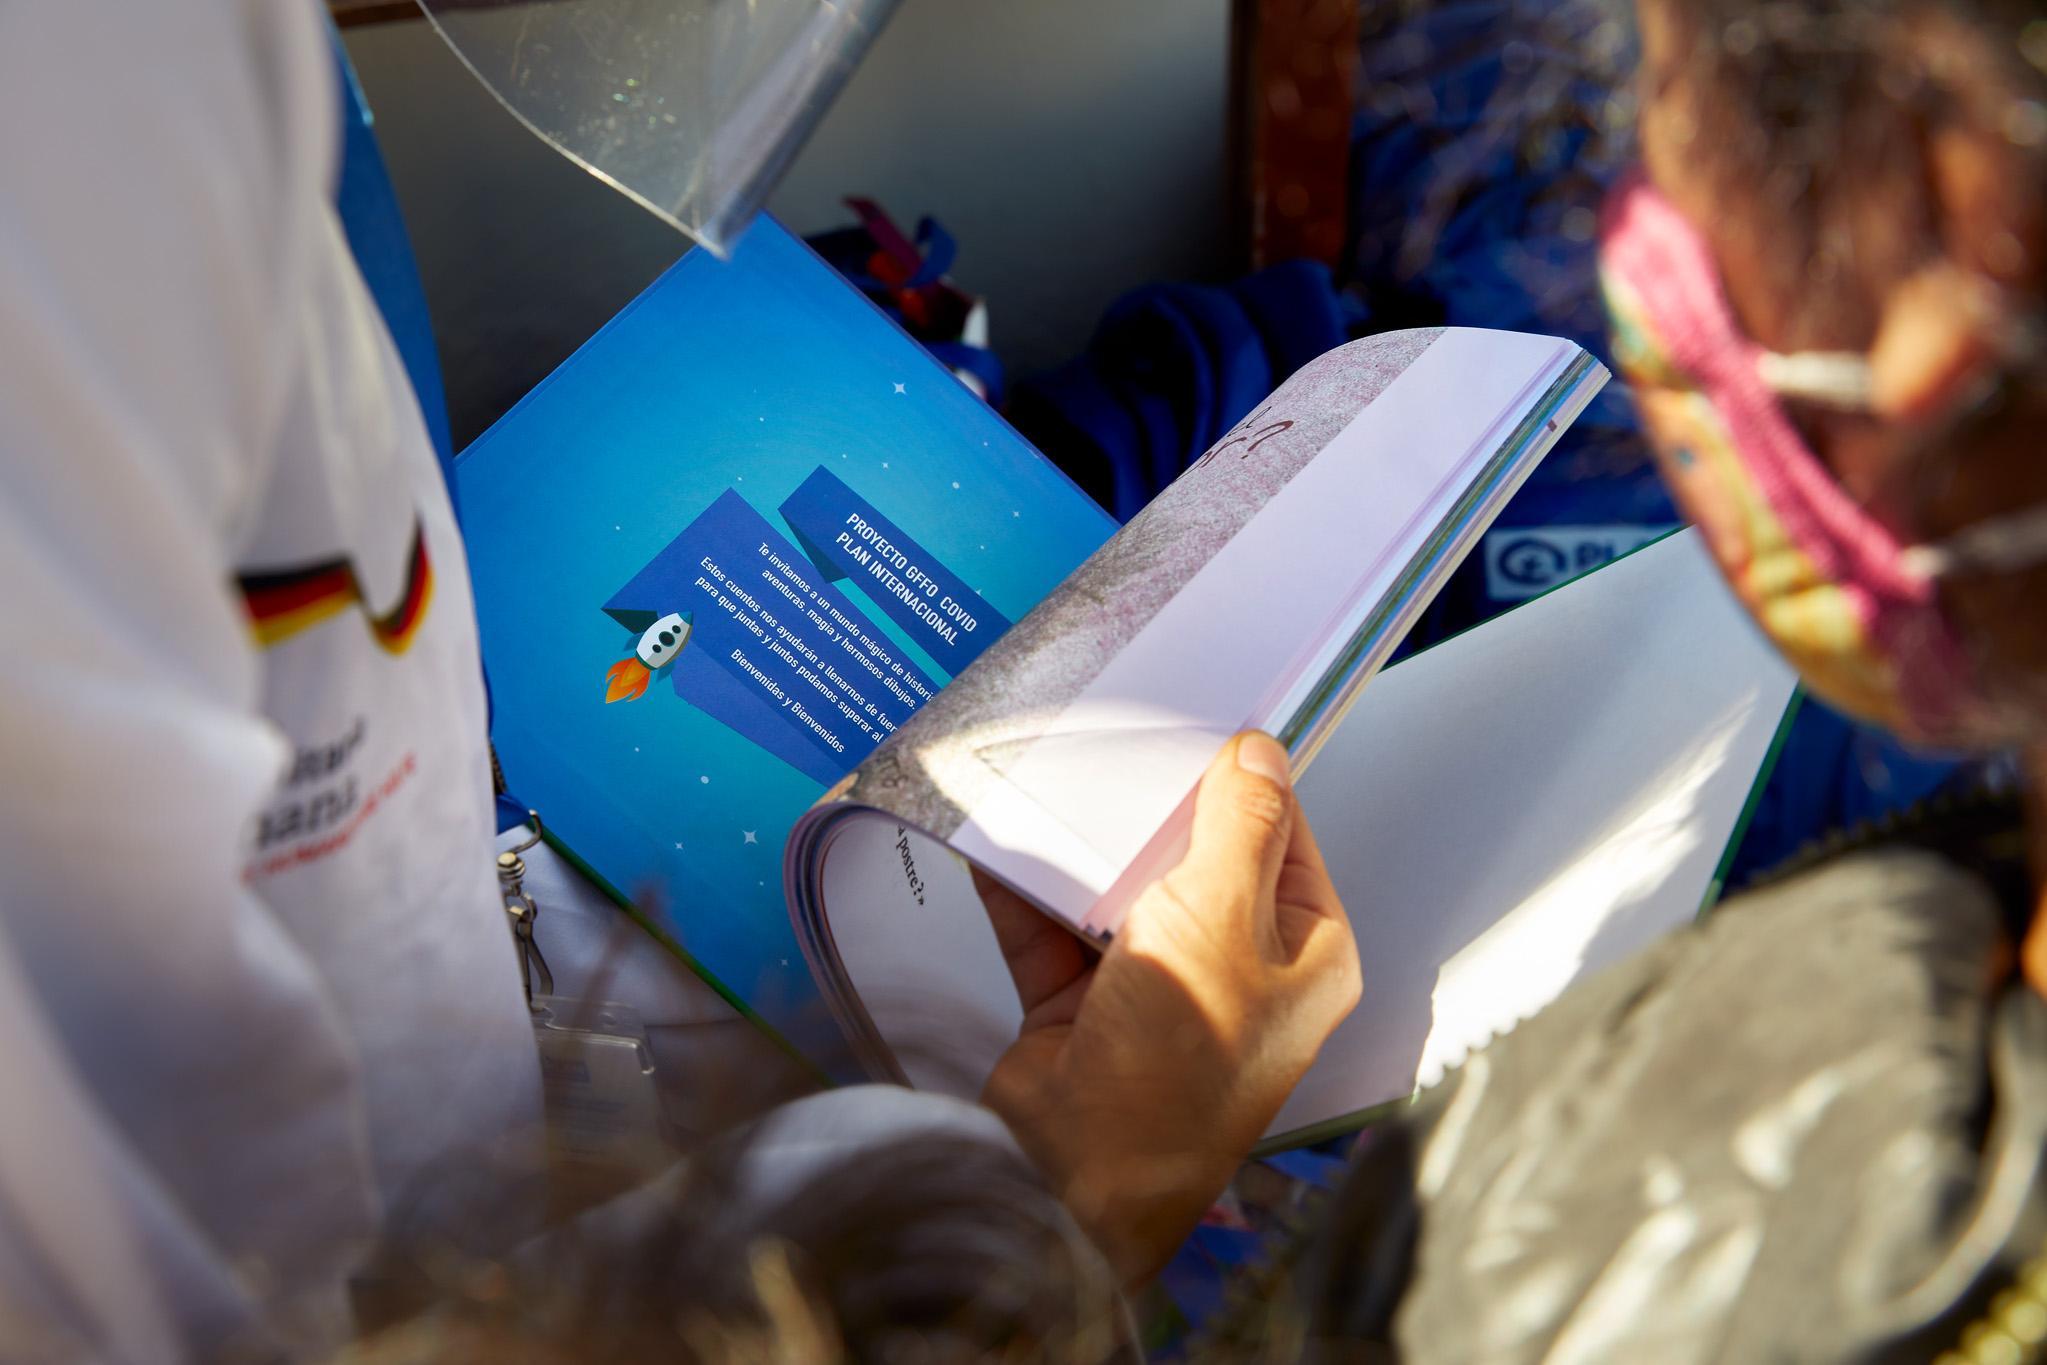 ESP: Diana Obando, psicóloga del Proyecto GFFO de Plan Internacional, muestra a una pequeña niña beneficiaria el contenido del cuento entregado junto al kit de juguetes. Quito, Ecuador. Diciembre 2020.  ENG: Diana Obando, psychologist of the GFFO Project of Plan International, shows a little girl who is a beneficiary the content of the story delivered with the toy kit. Quito, Ecuador. December 2020.